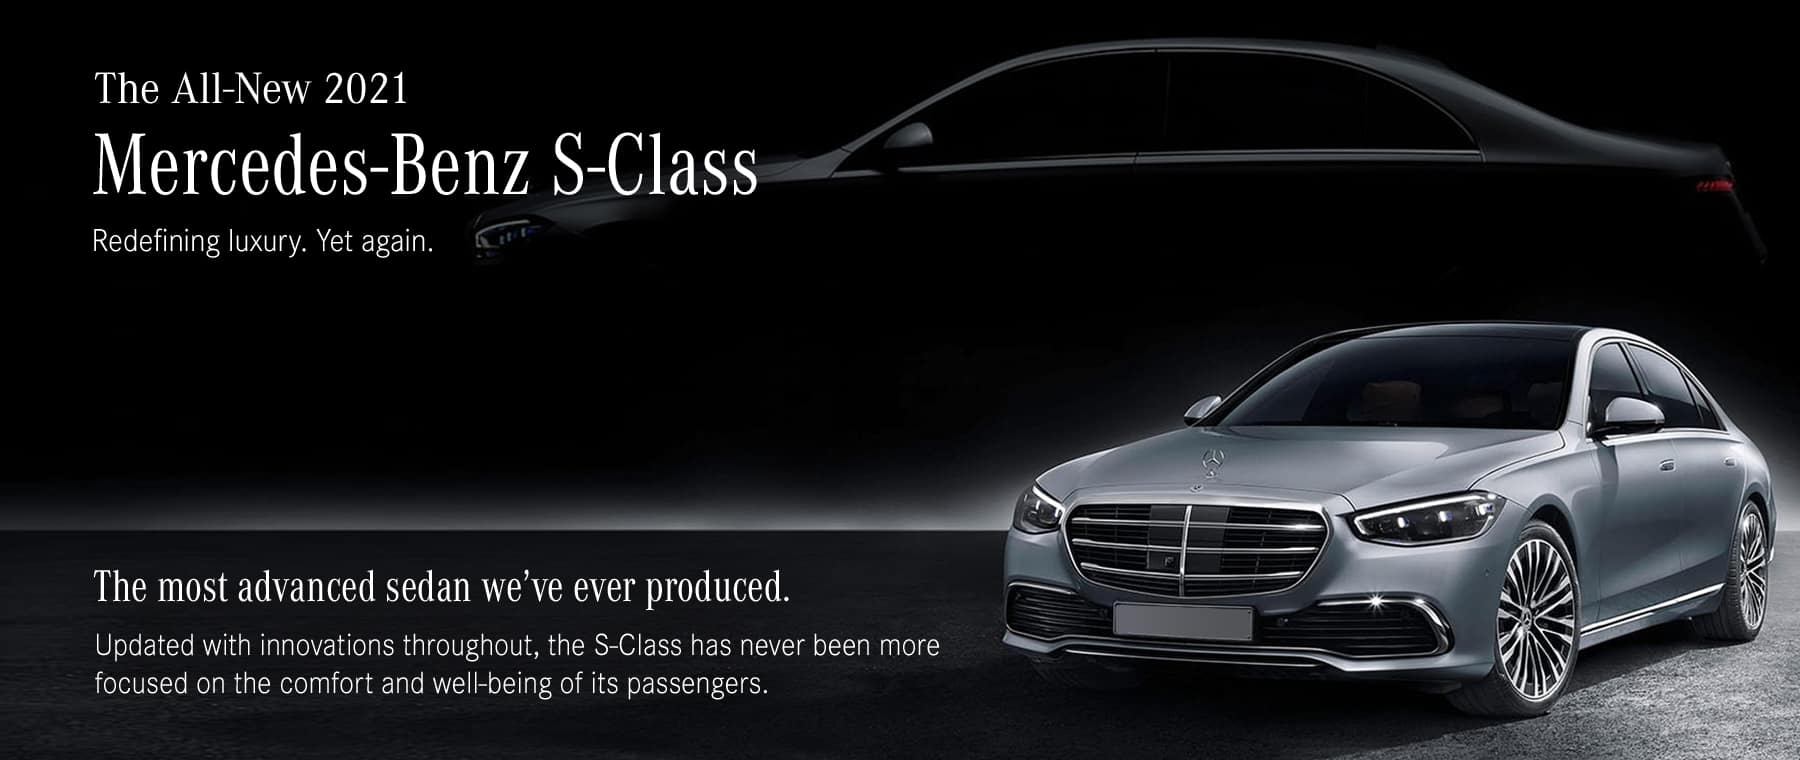 Homepage-Slider-MBS-New-2021-S-Class